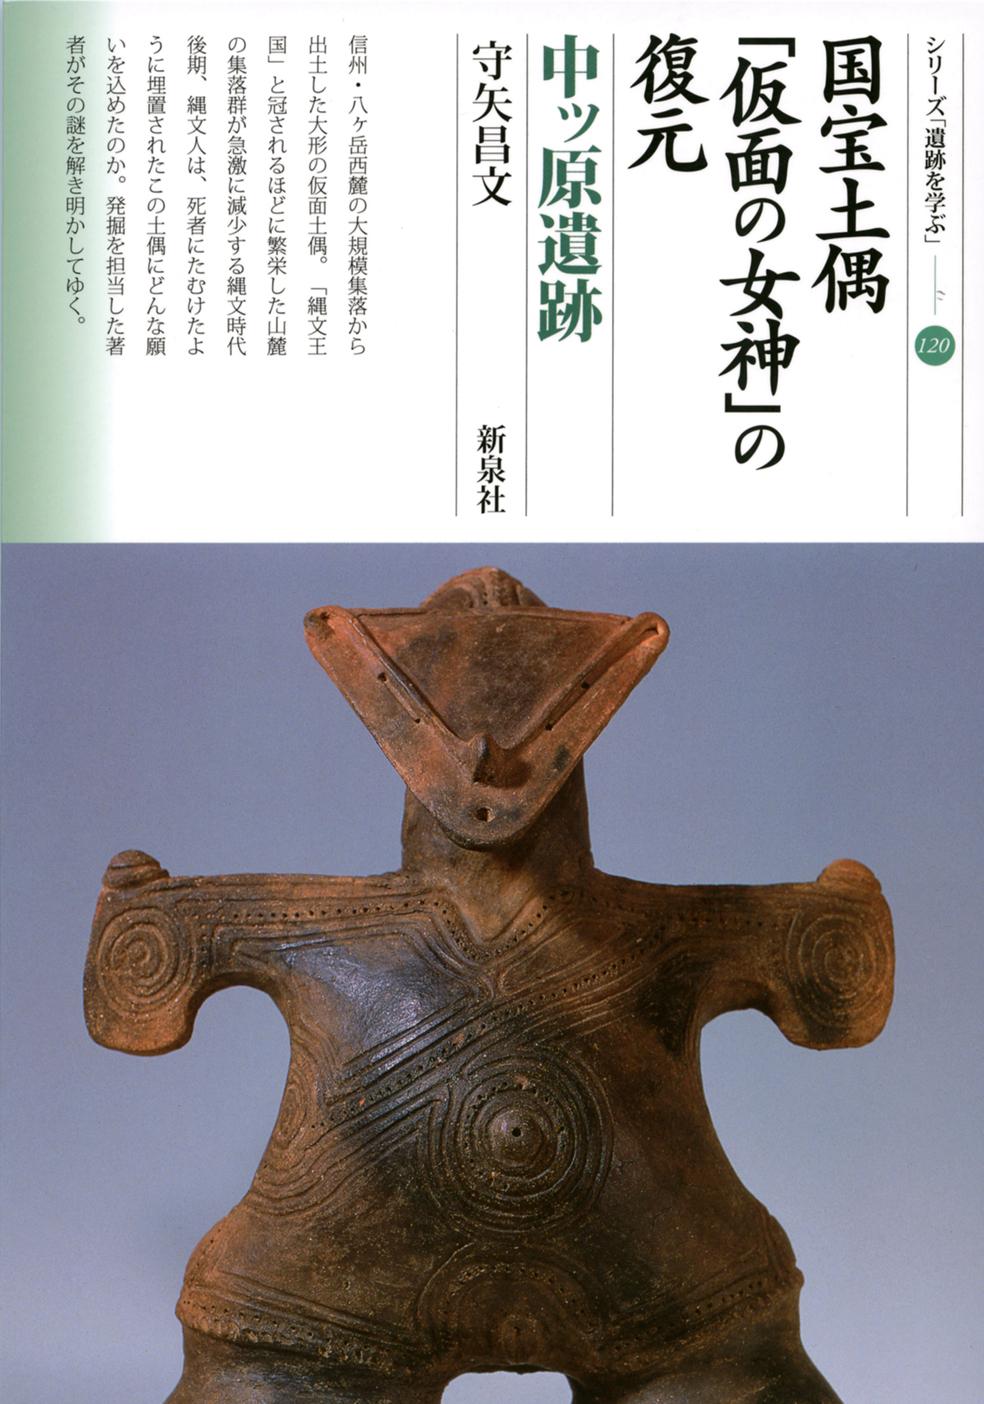 国宝土偶「仮面の女神」の復元・中ッ原遺跡FTP